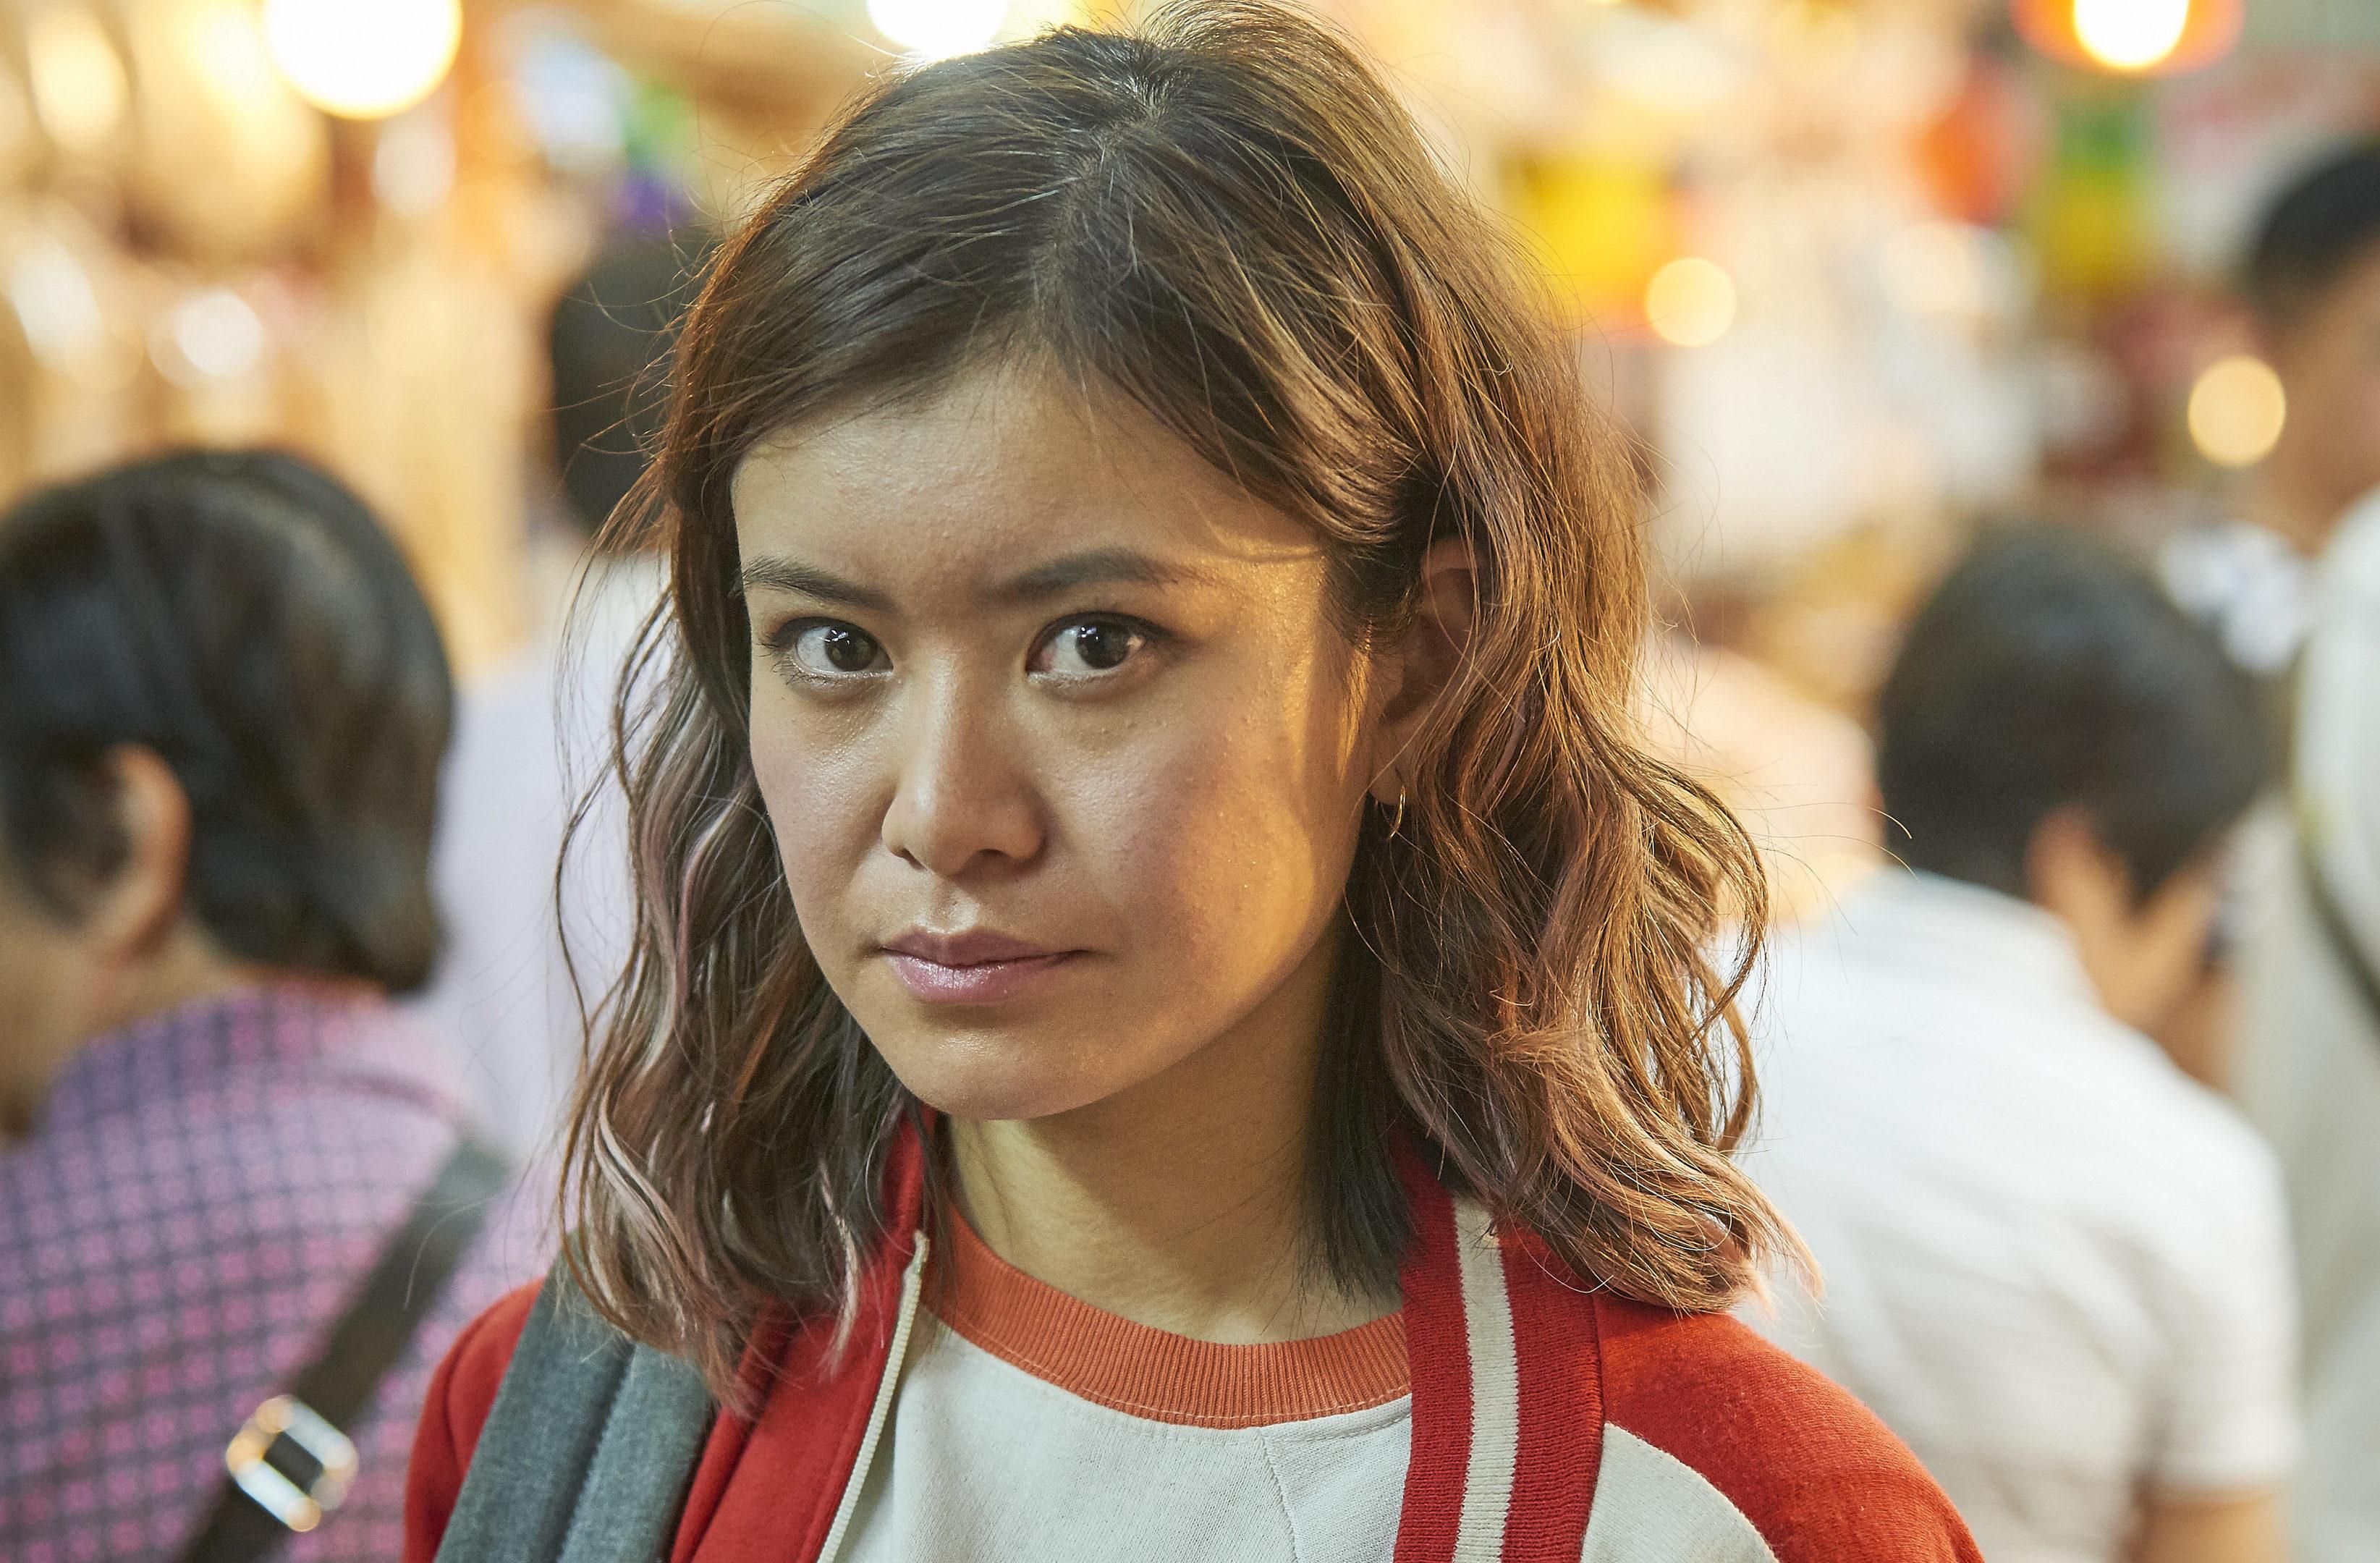 Katie Leung bonnie wright